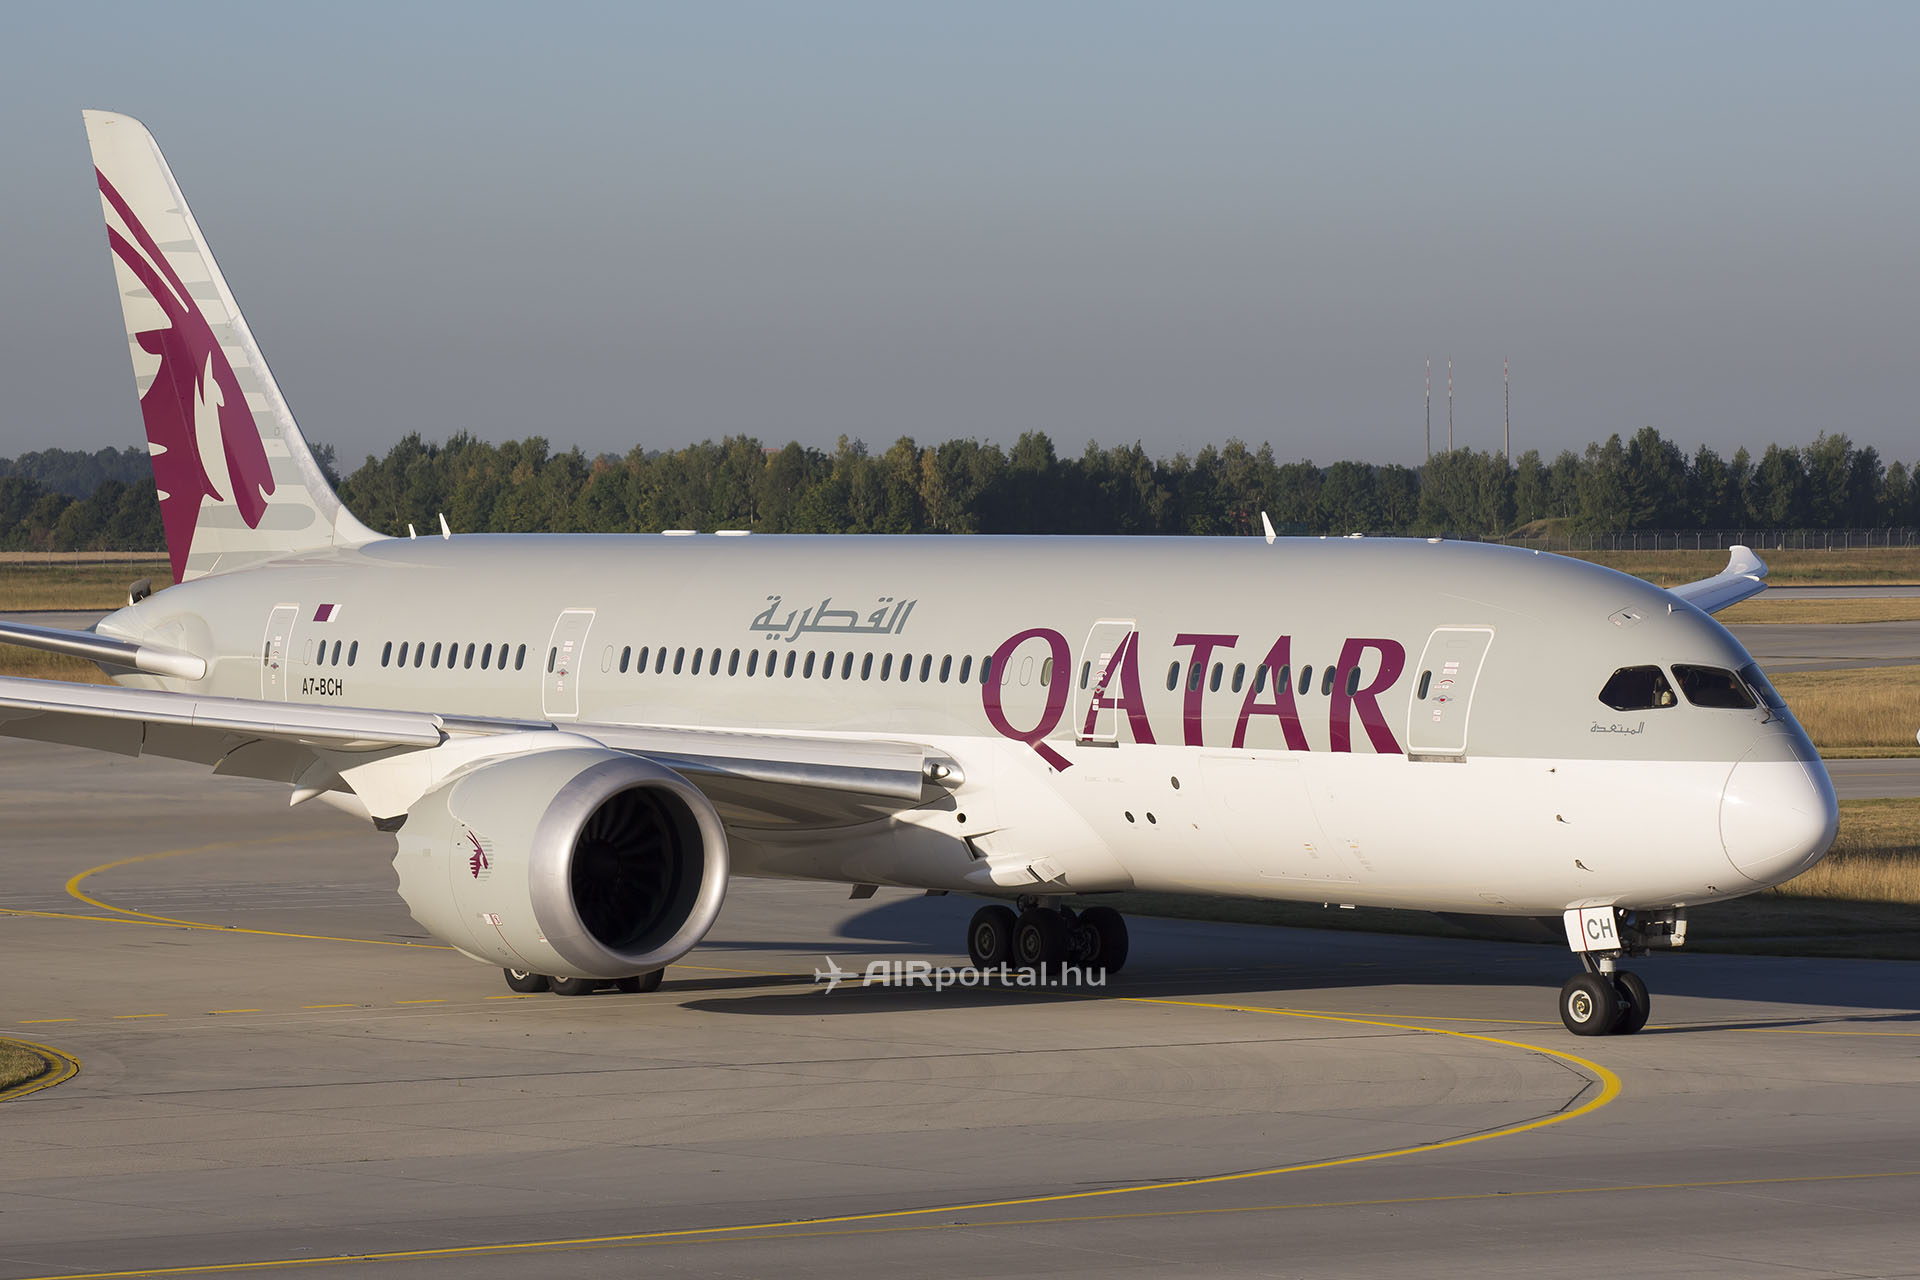 A Qatar Airways egyik Boeing 787 Dreamliner repülőgépe. (Fotó: AIRportal.hu) | © AIRportal.hu